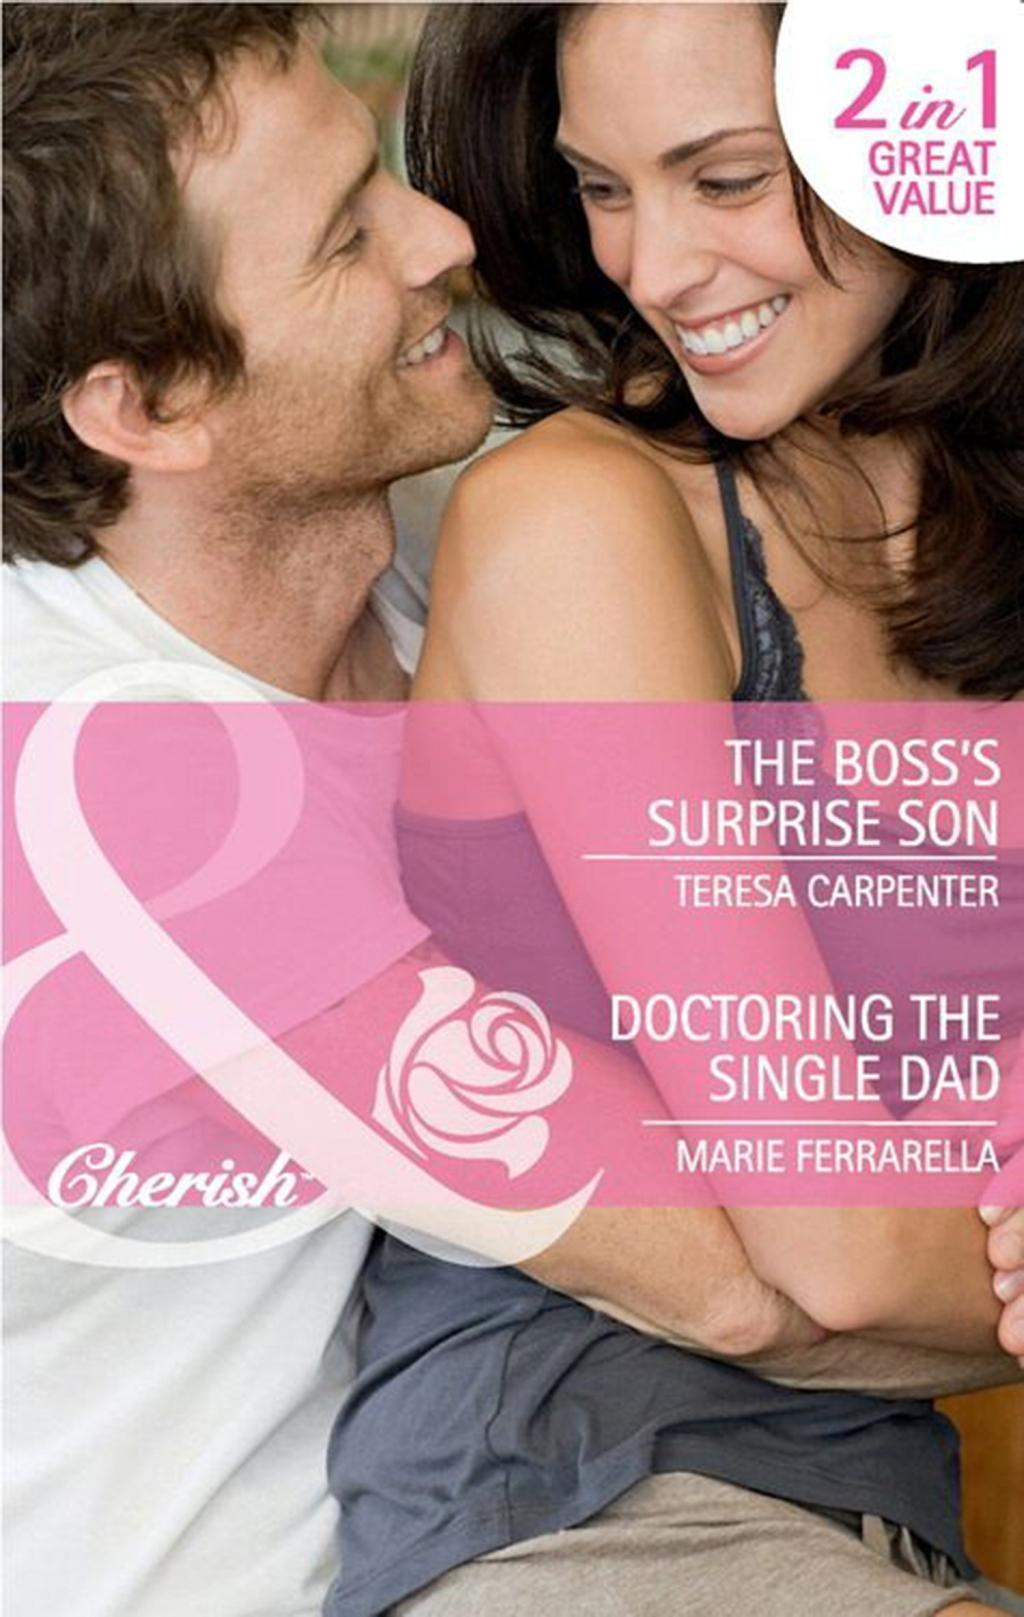 The Boss's Surprise Son / Doctoring the Single Dad: The Boss's Surprise Son / Doctoring the Single Dad (Mills & Boon Cherish)